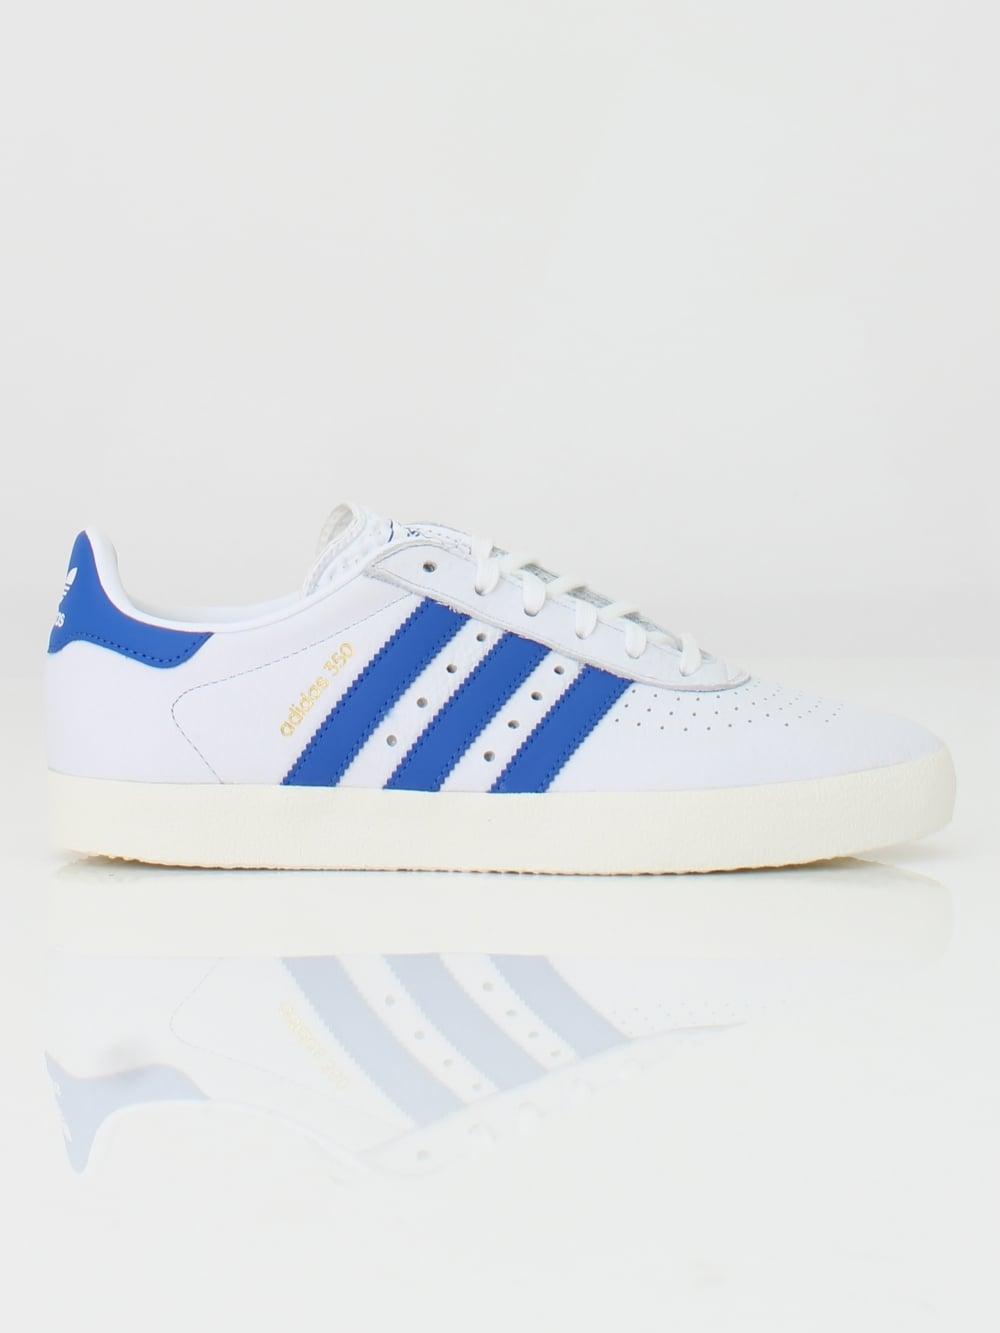 finest selection 1de37 c3e89 350 Trainers - White